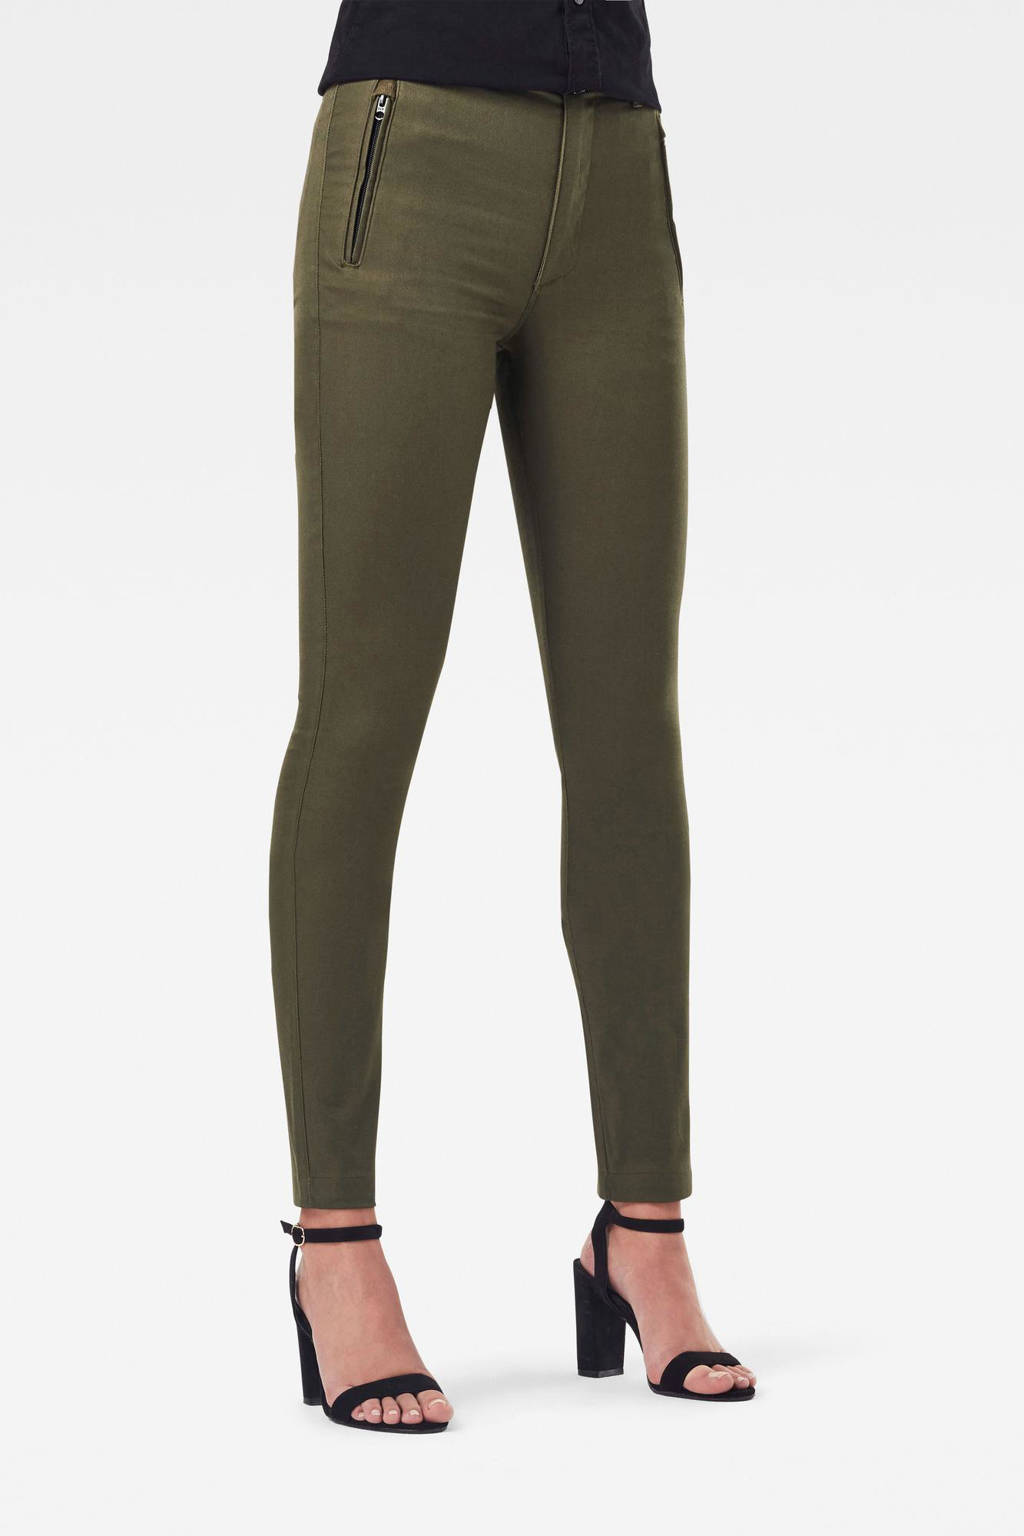 G-Star RAW Weld high waist skinny broek groen, Groen